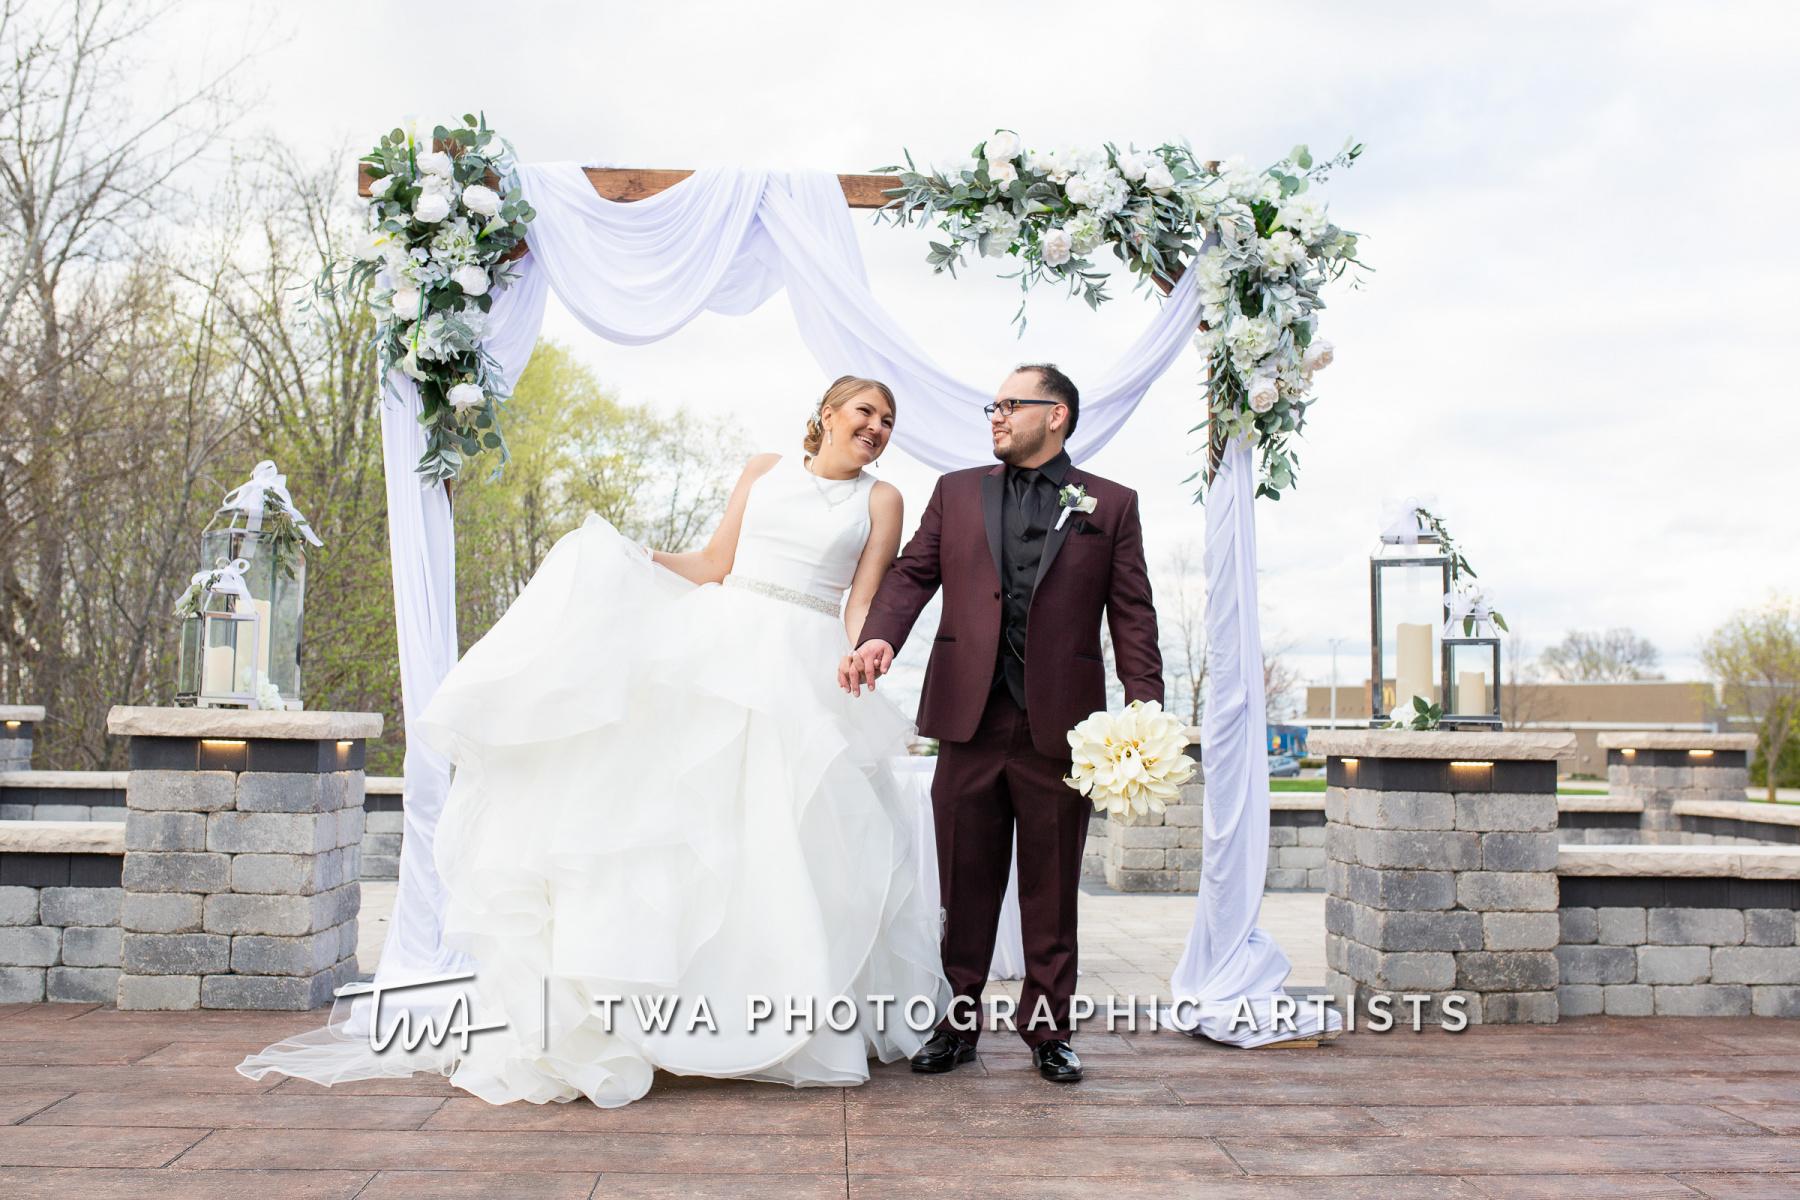 Chicago-Wedding-Photographers-Martini-Banquets_Borys_Caballero_MJ_SG-057-0407